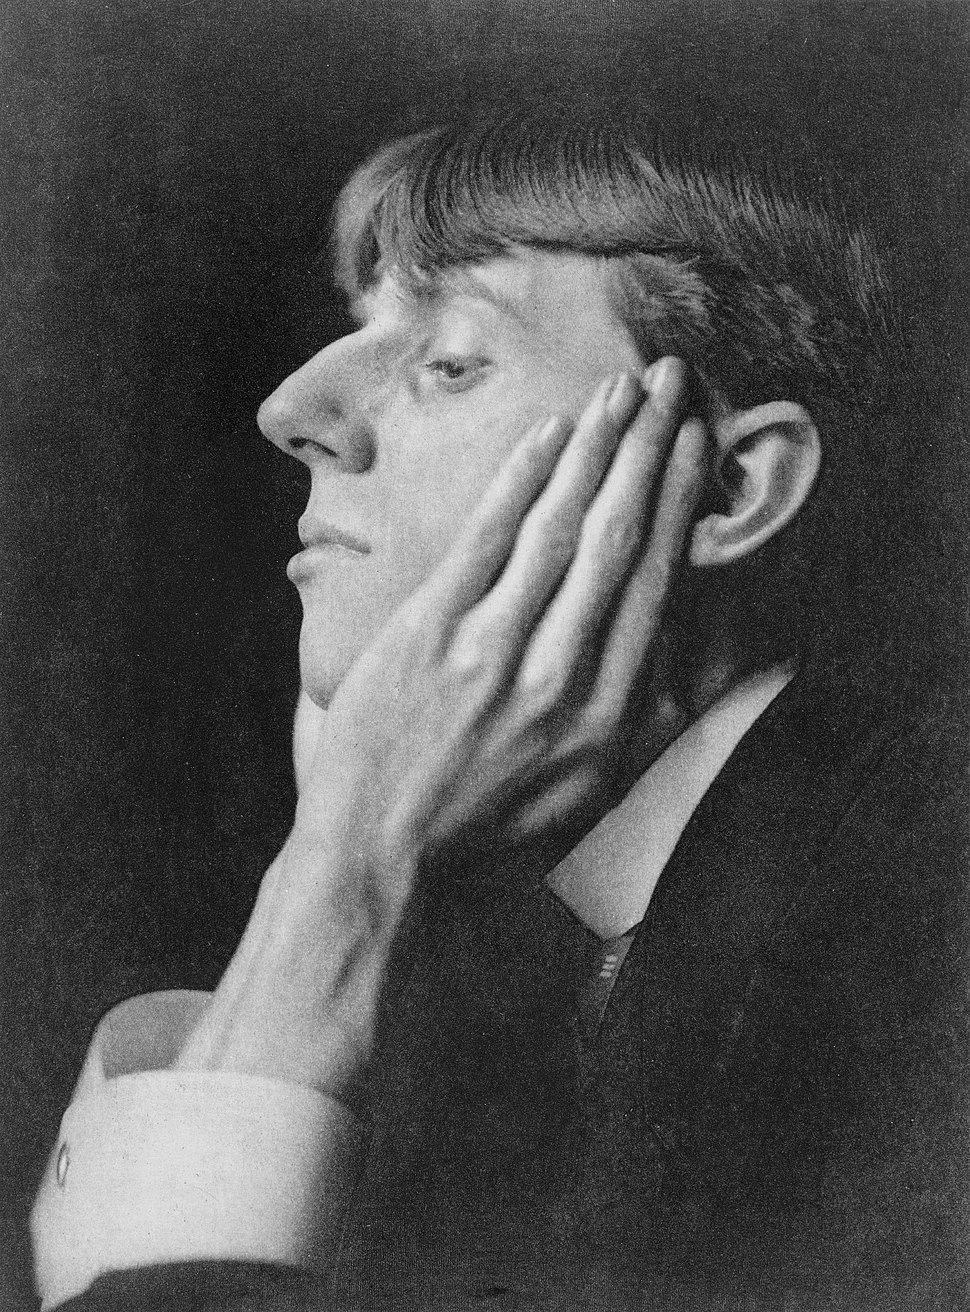 Aubrey Beardsley ca. 1895